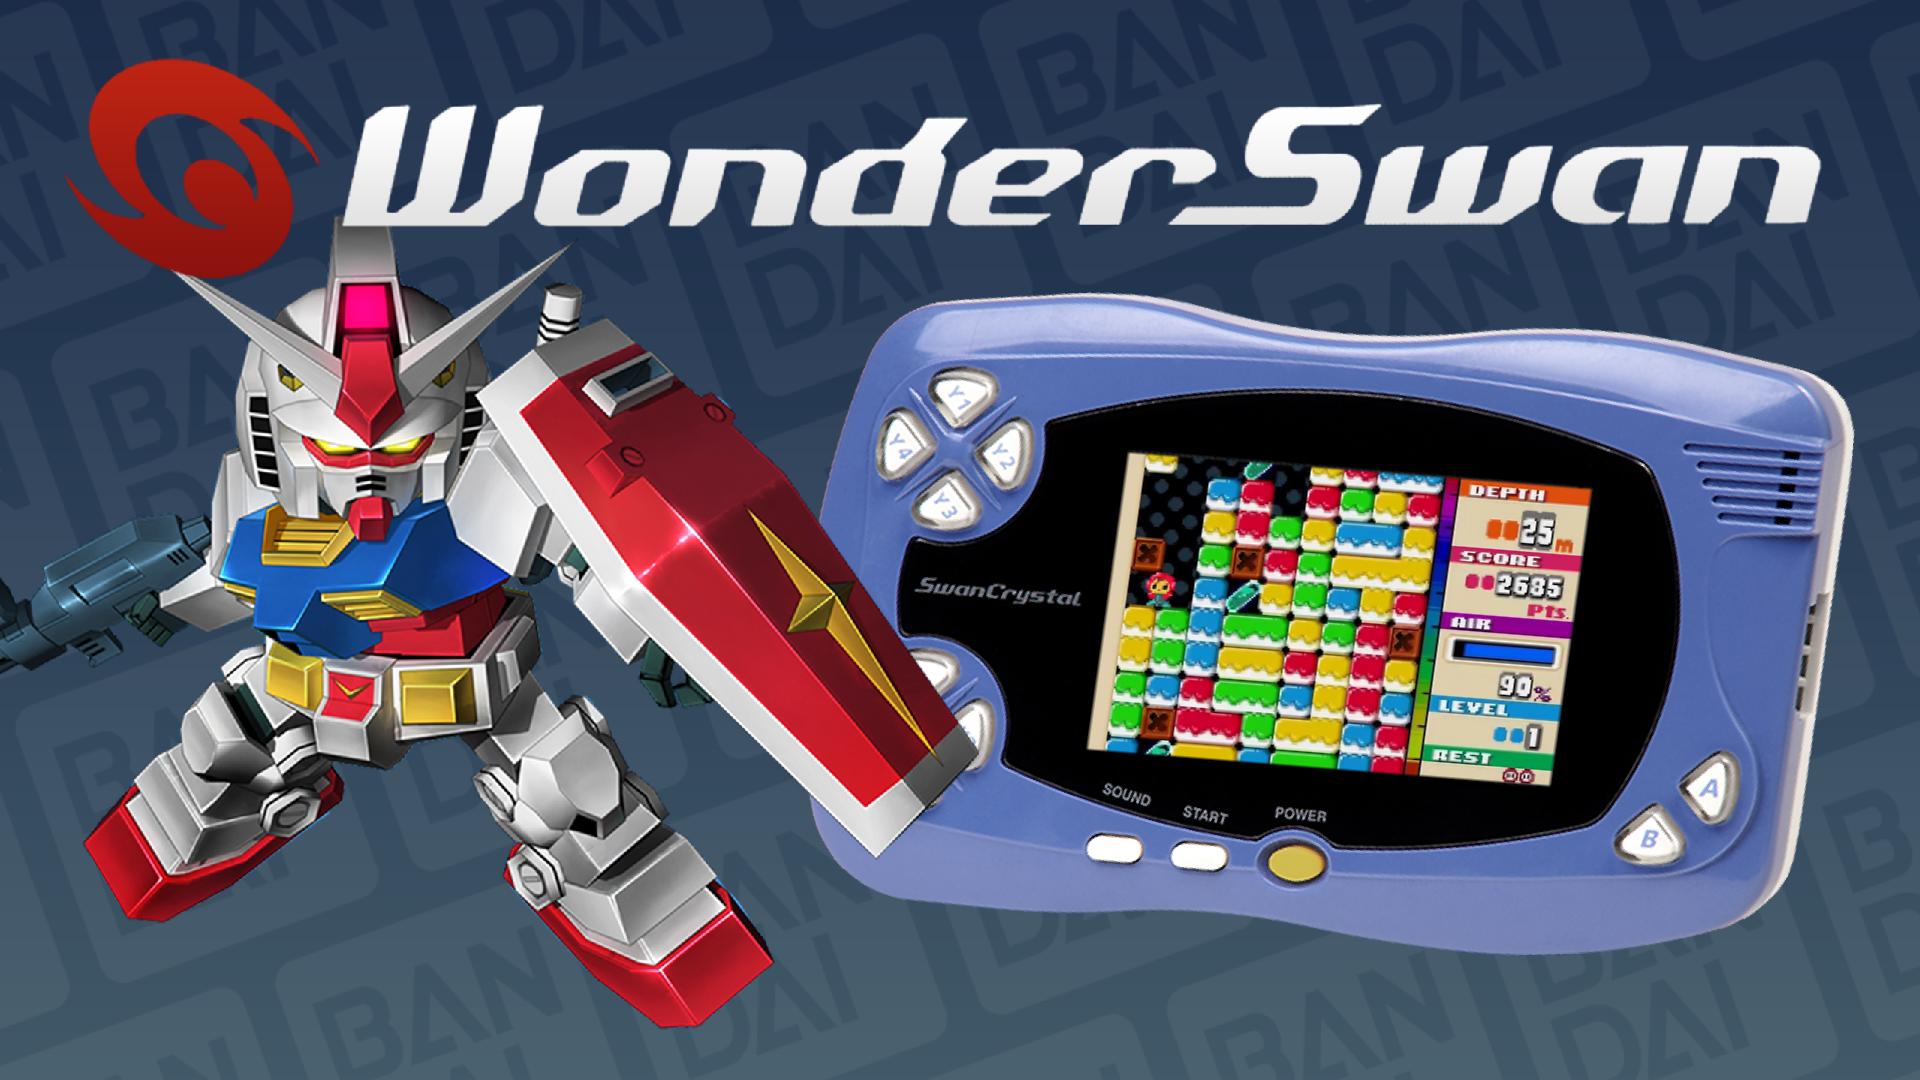 [7 Jogos Indispensáveis] - WonderSwam + Color 6f76c797752085a635538aca8699a6a8-bandai-wonderswan-color